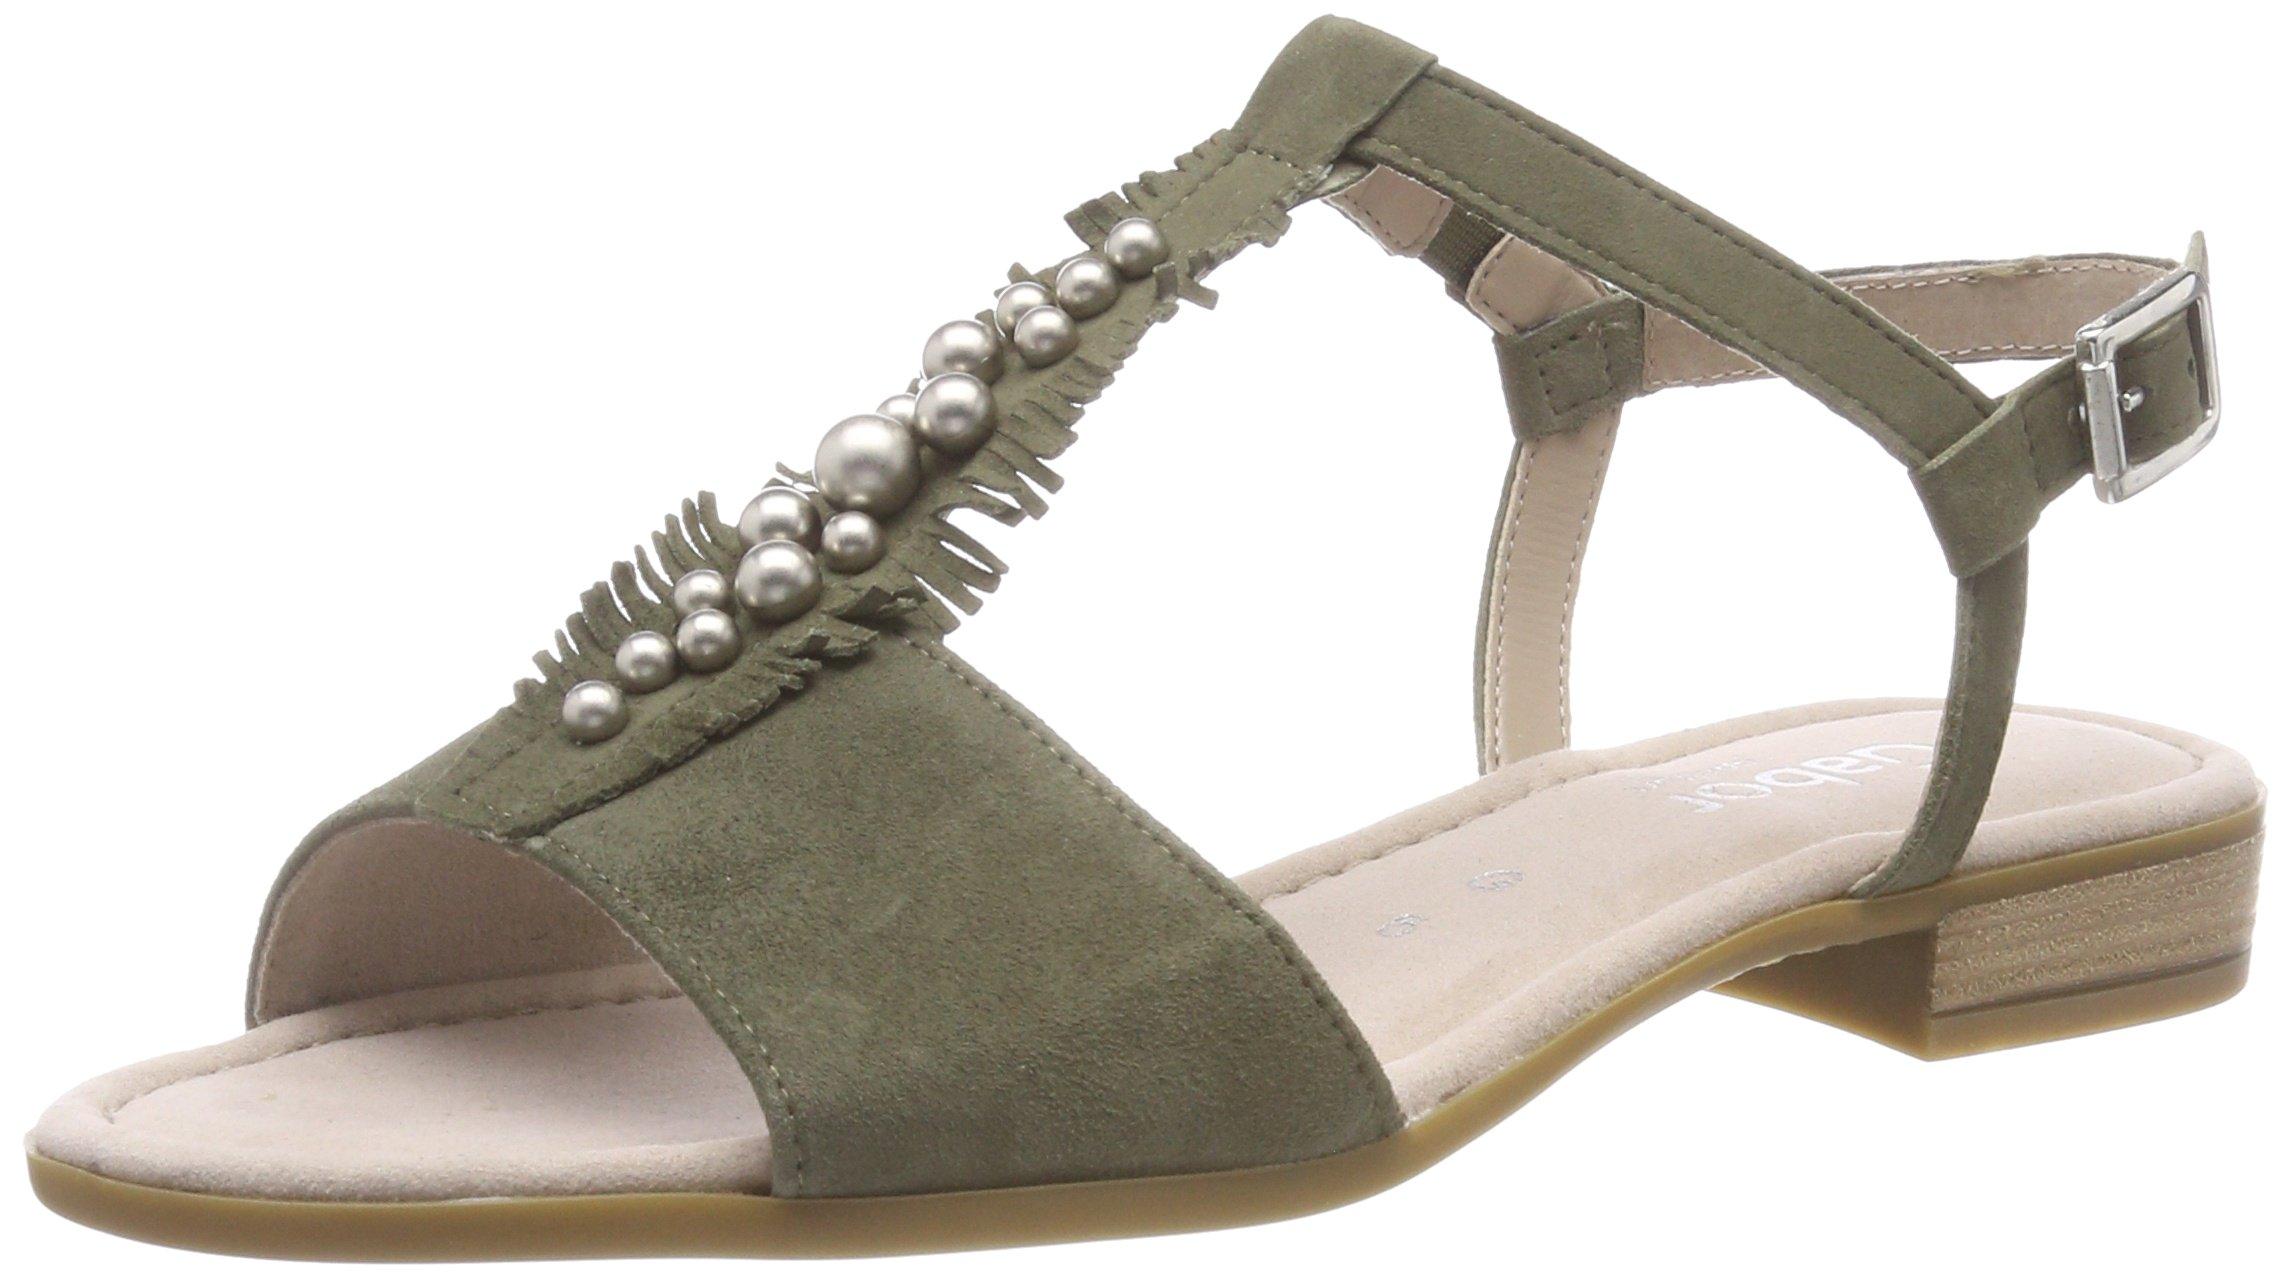 SportSandales Gabor Shoes Eu Comfort Cheville FemmeVertoliv39 Bride tChrdsQ